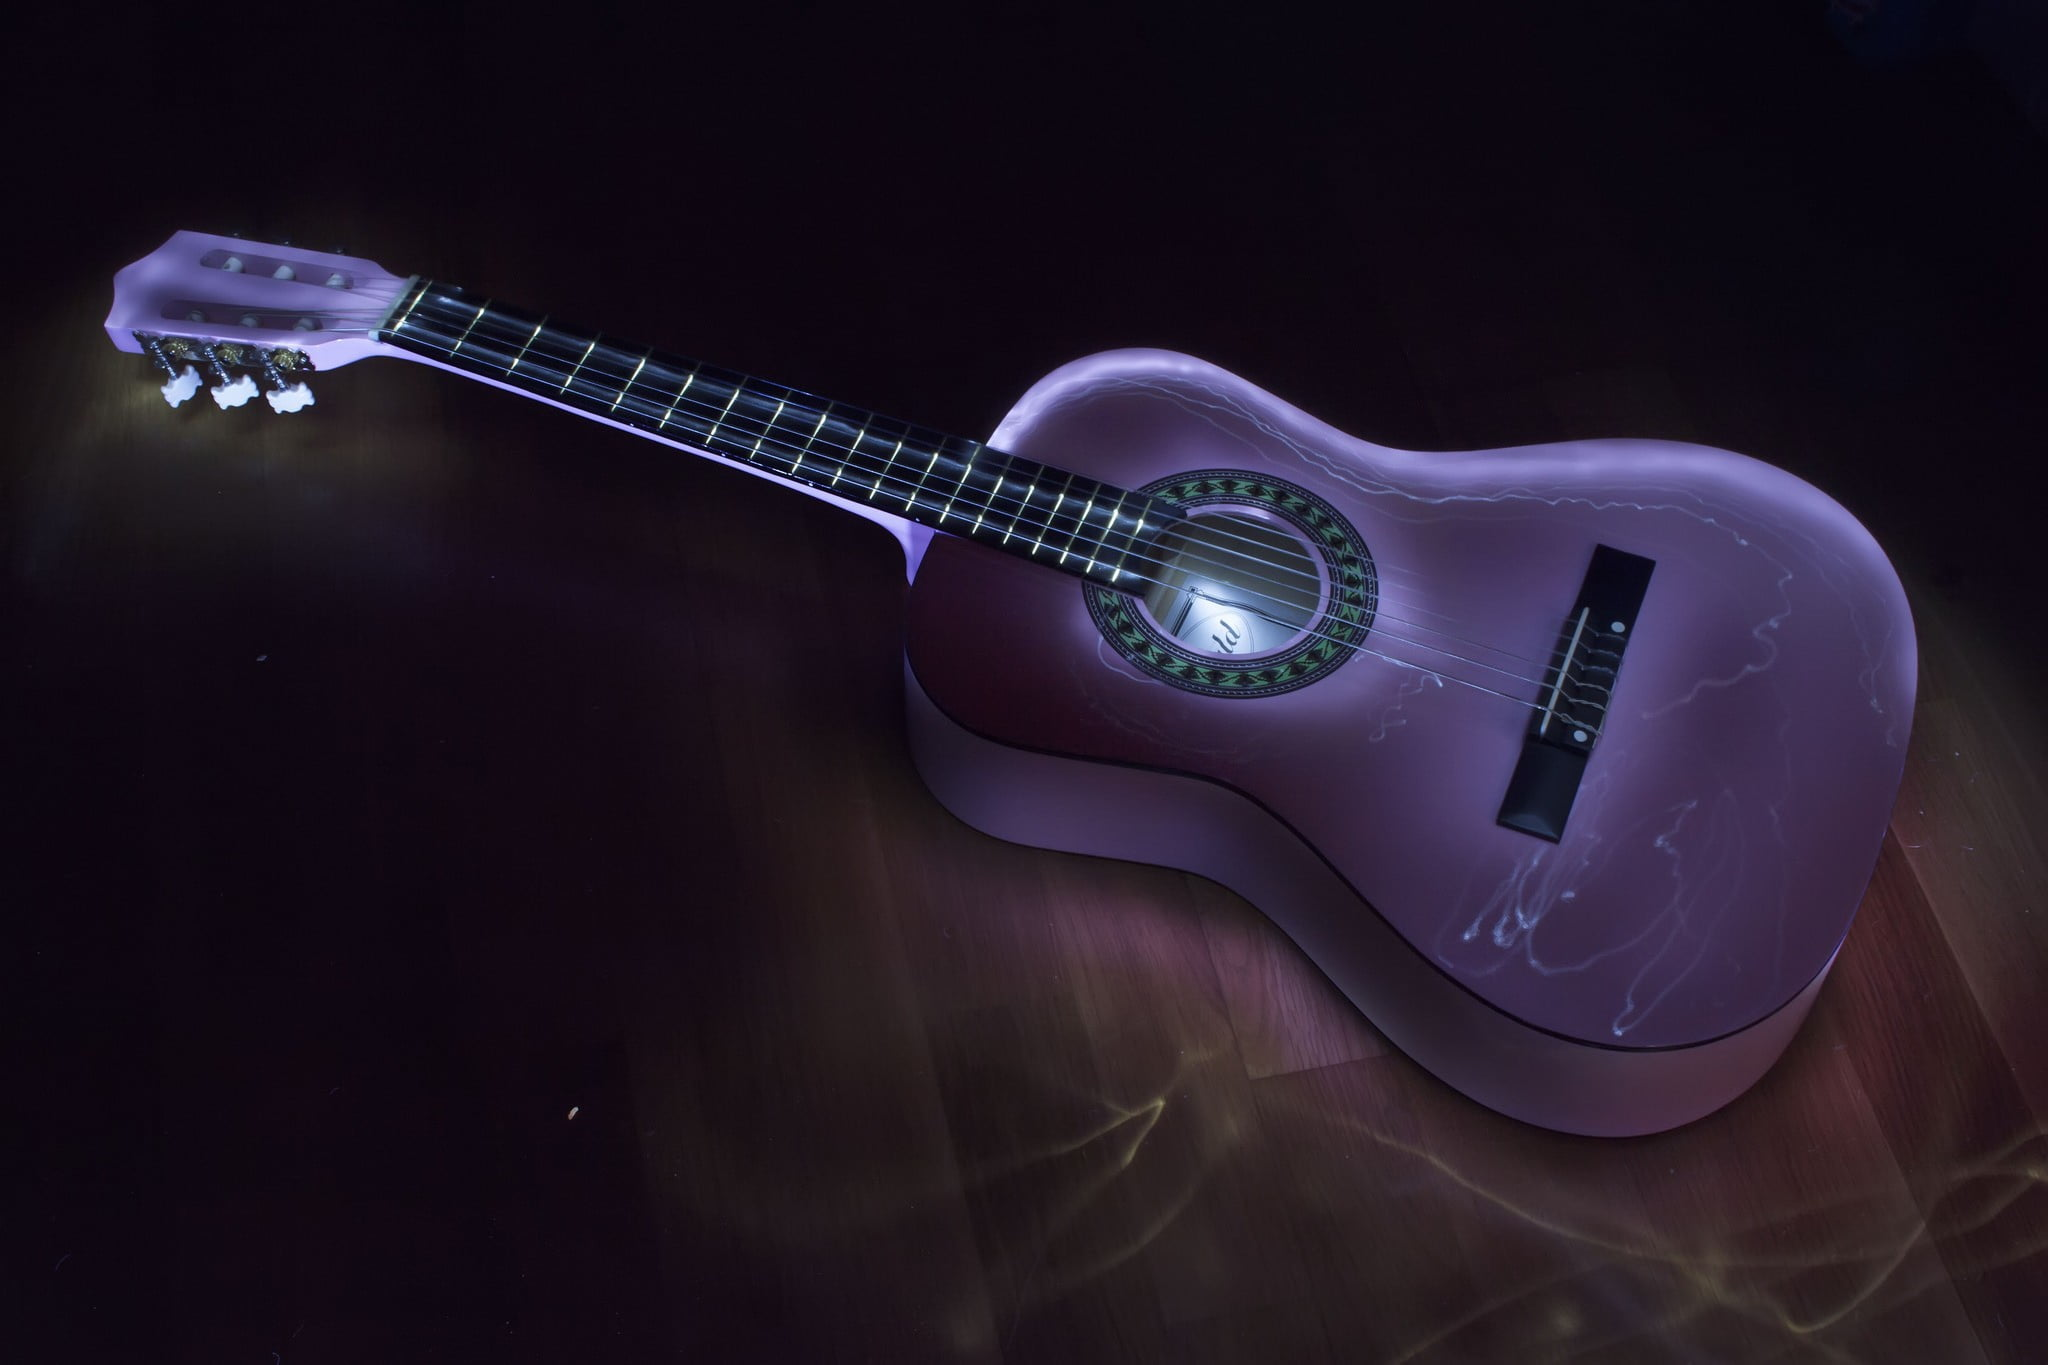 3d guitar wallpaper 72676